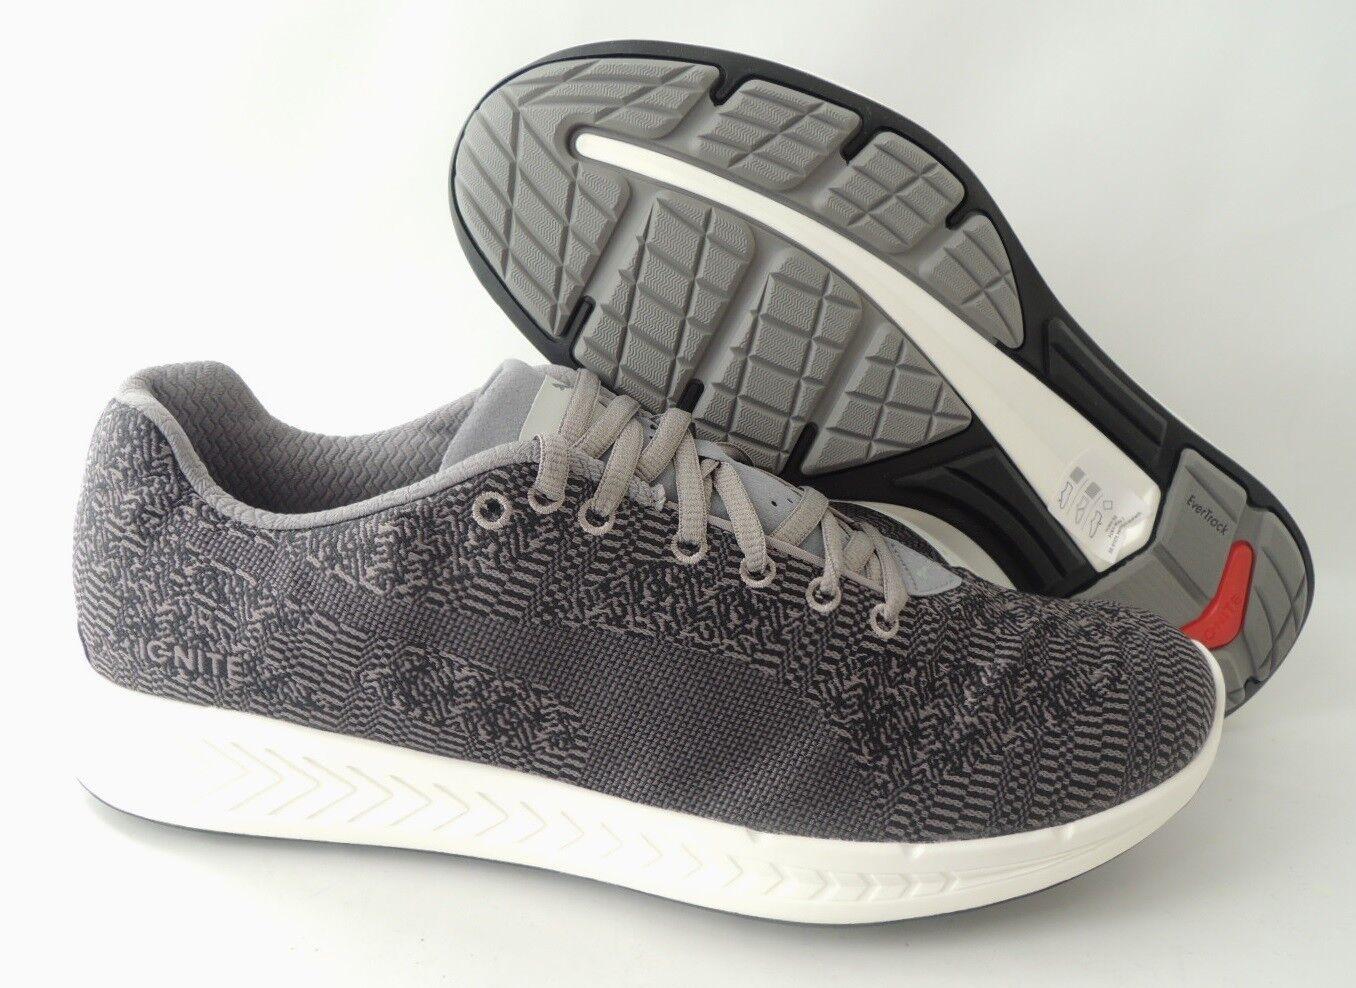 NEU Puma Ignite Woven Men 42,5 Laufschuhe Running Schuhe Sneaker 360819-01 TOP